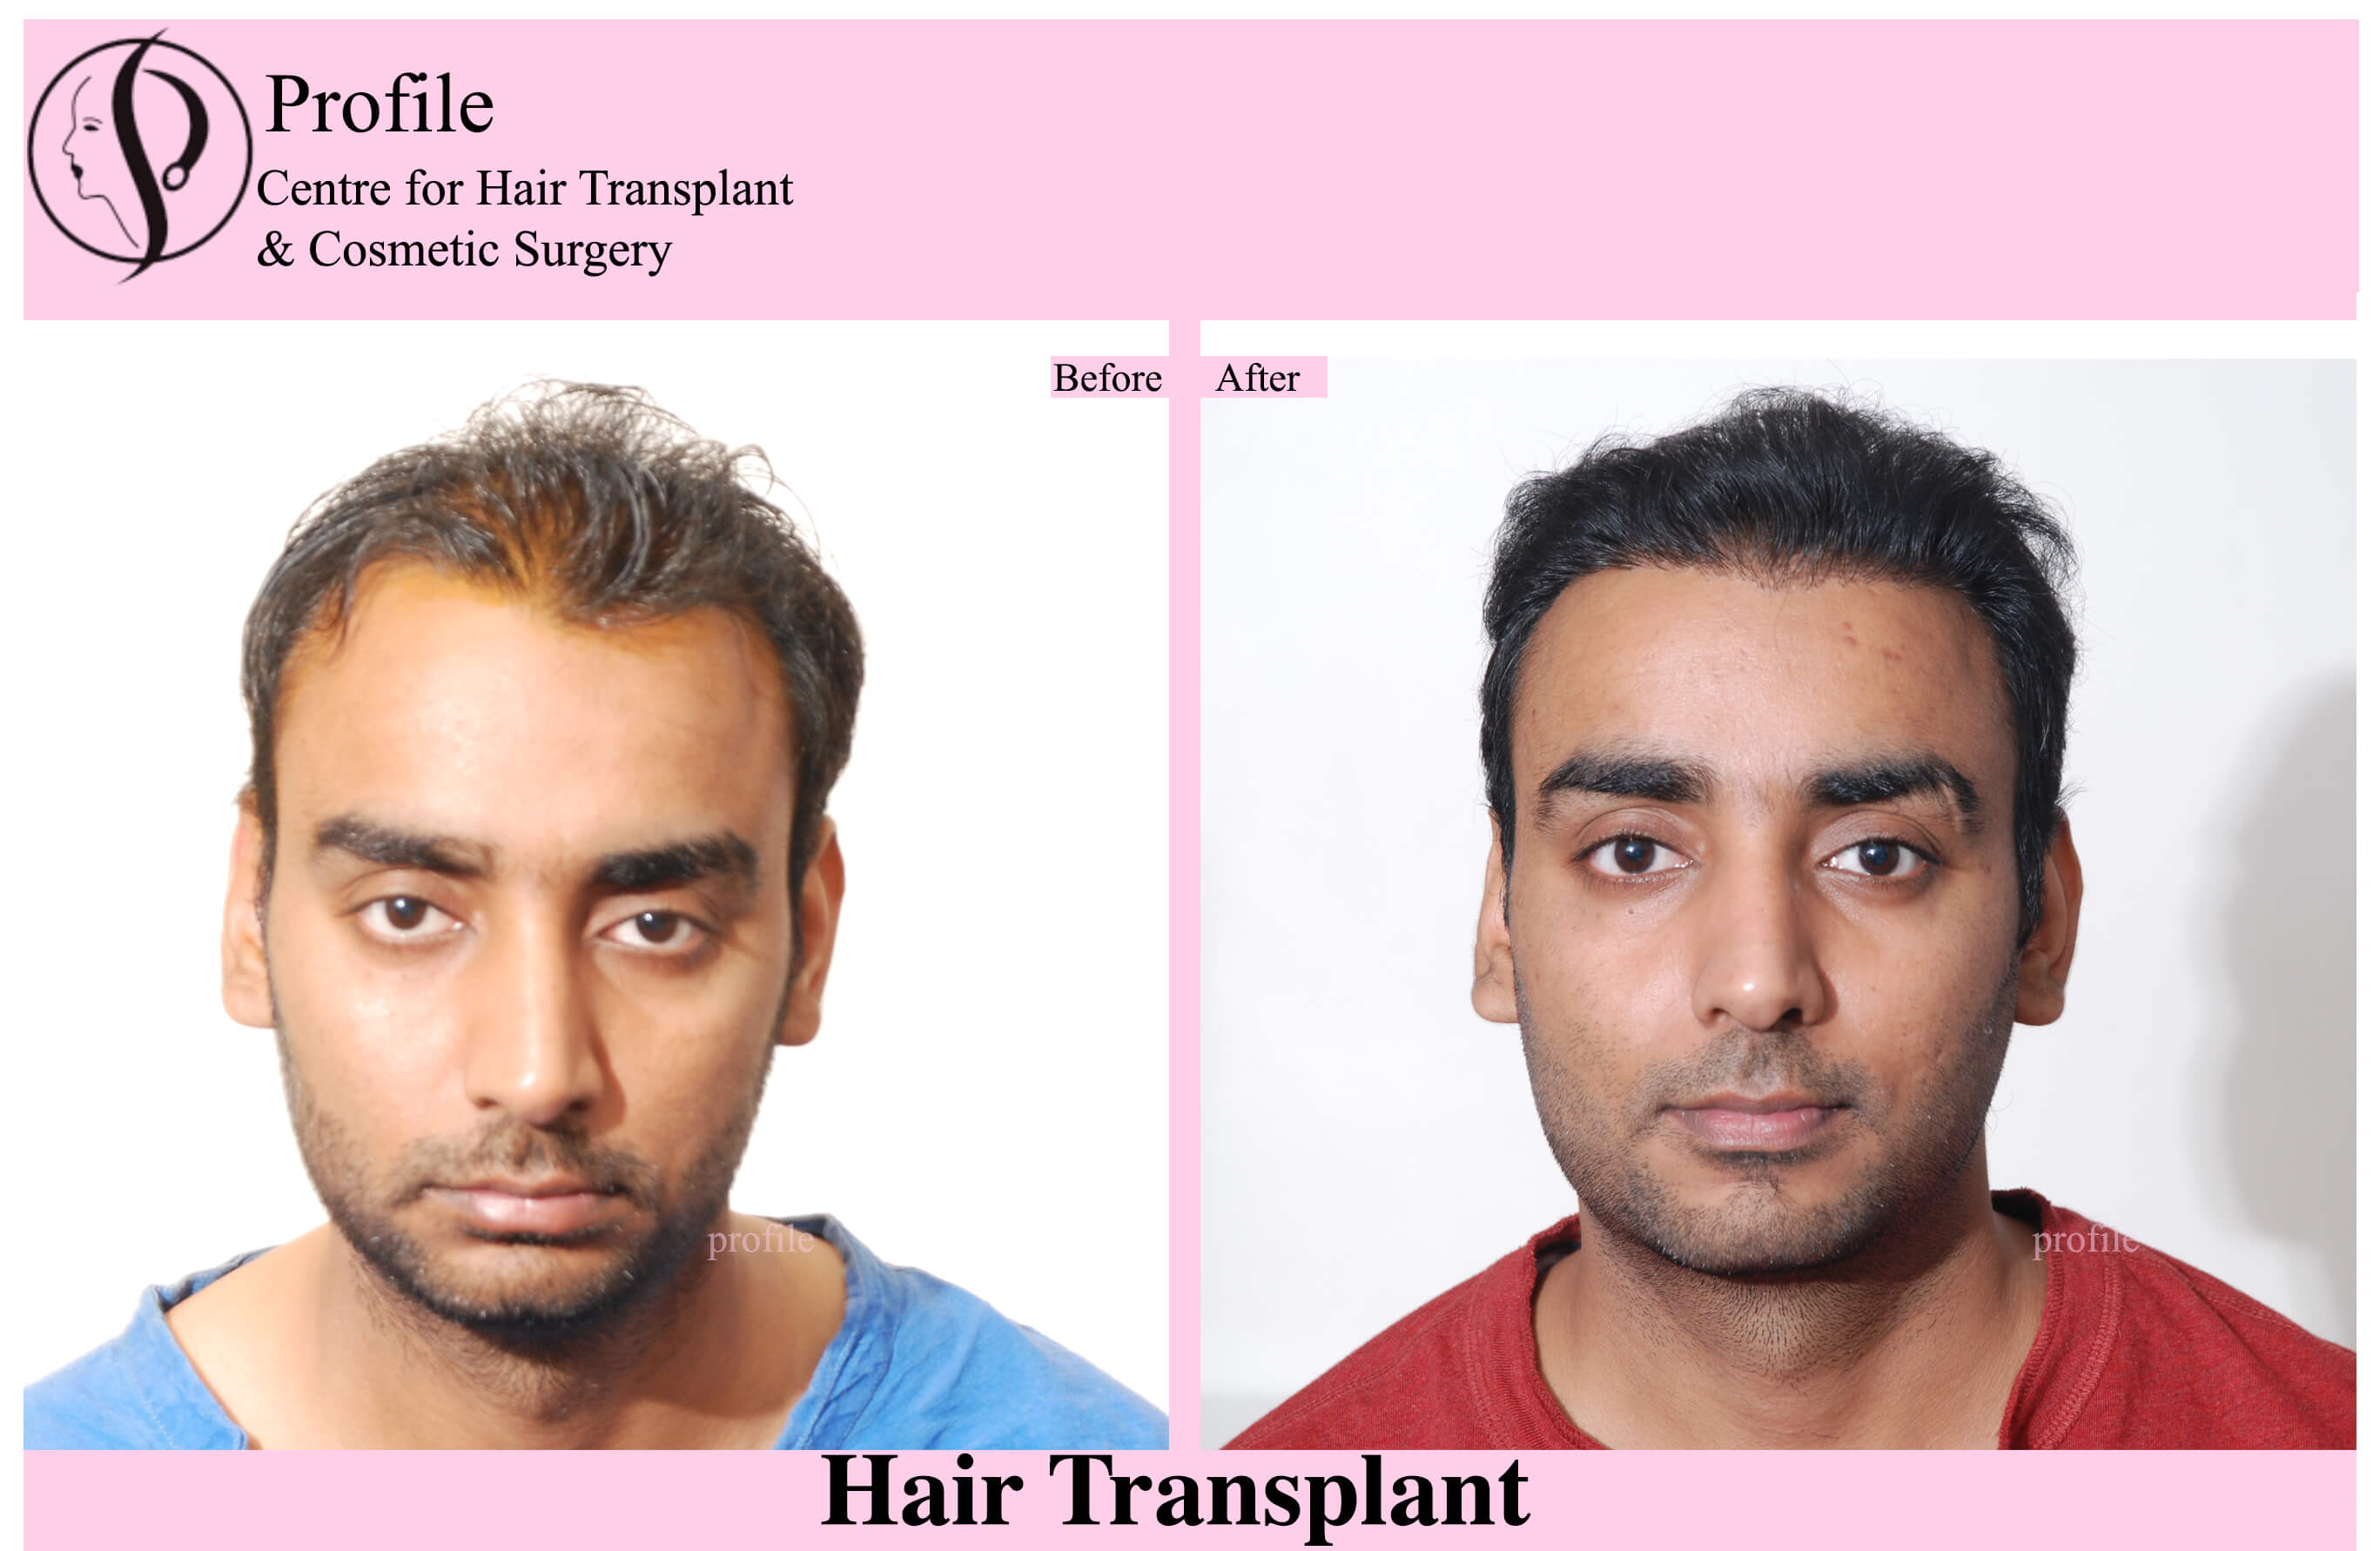 Dr. Harinder Pal Singh